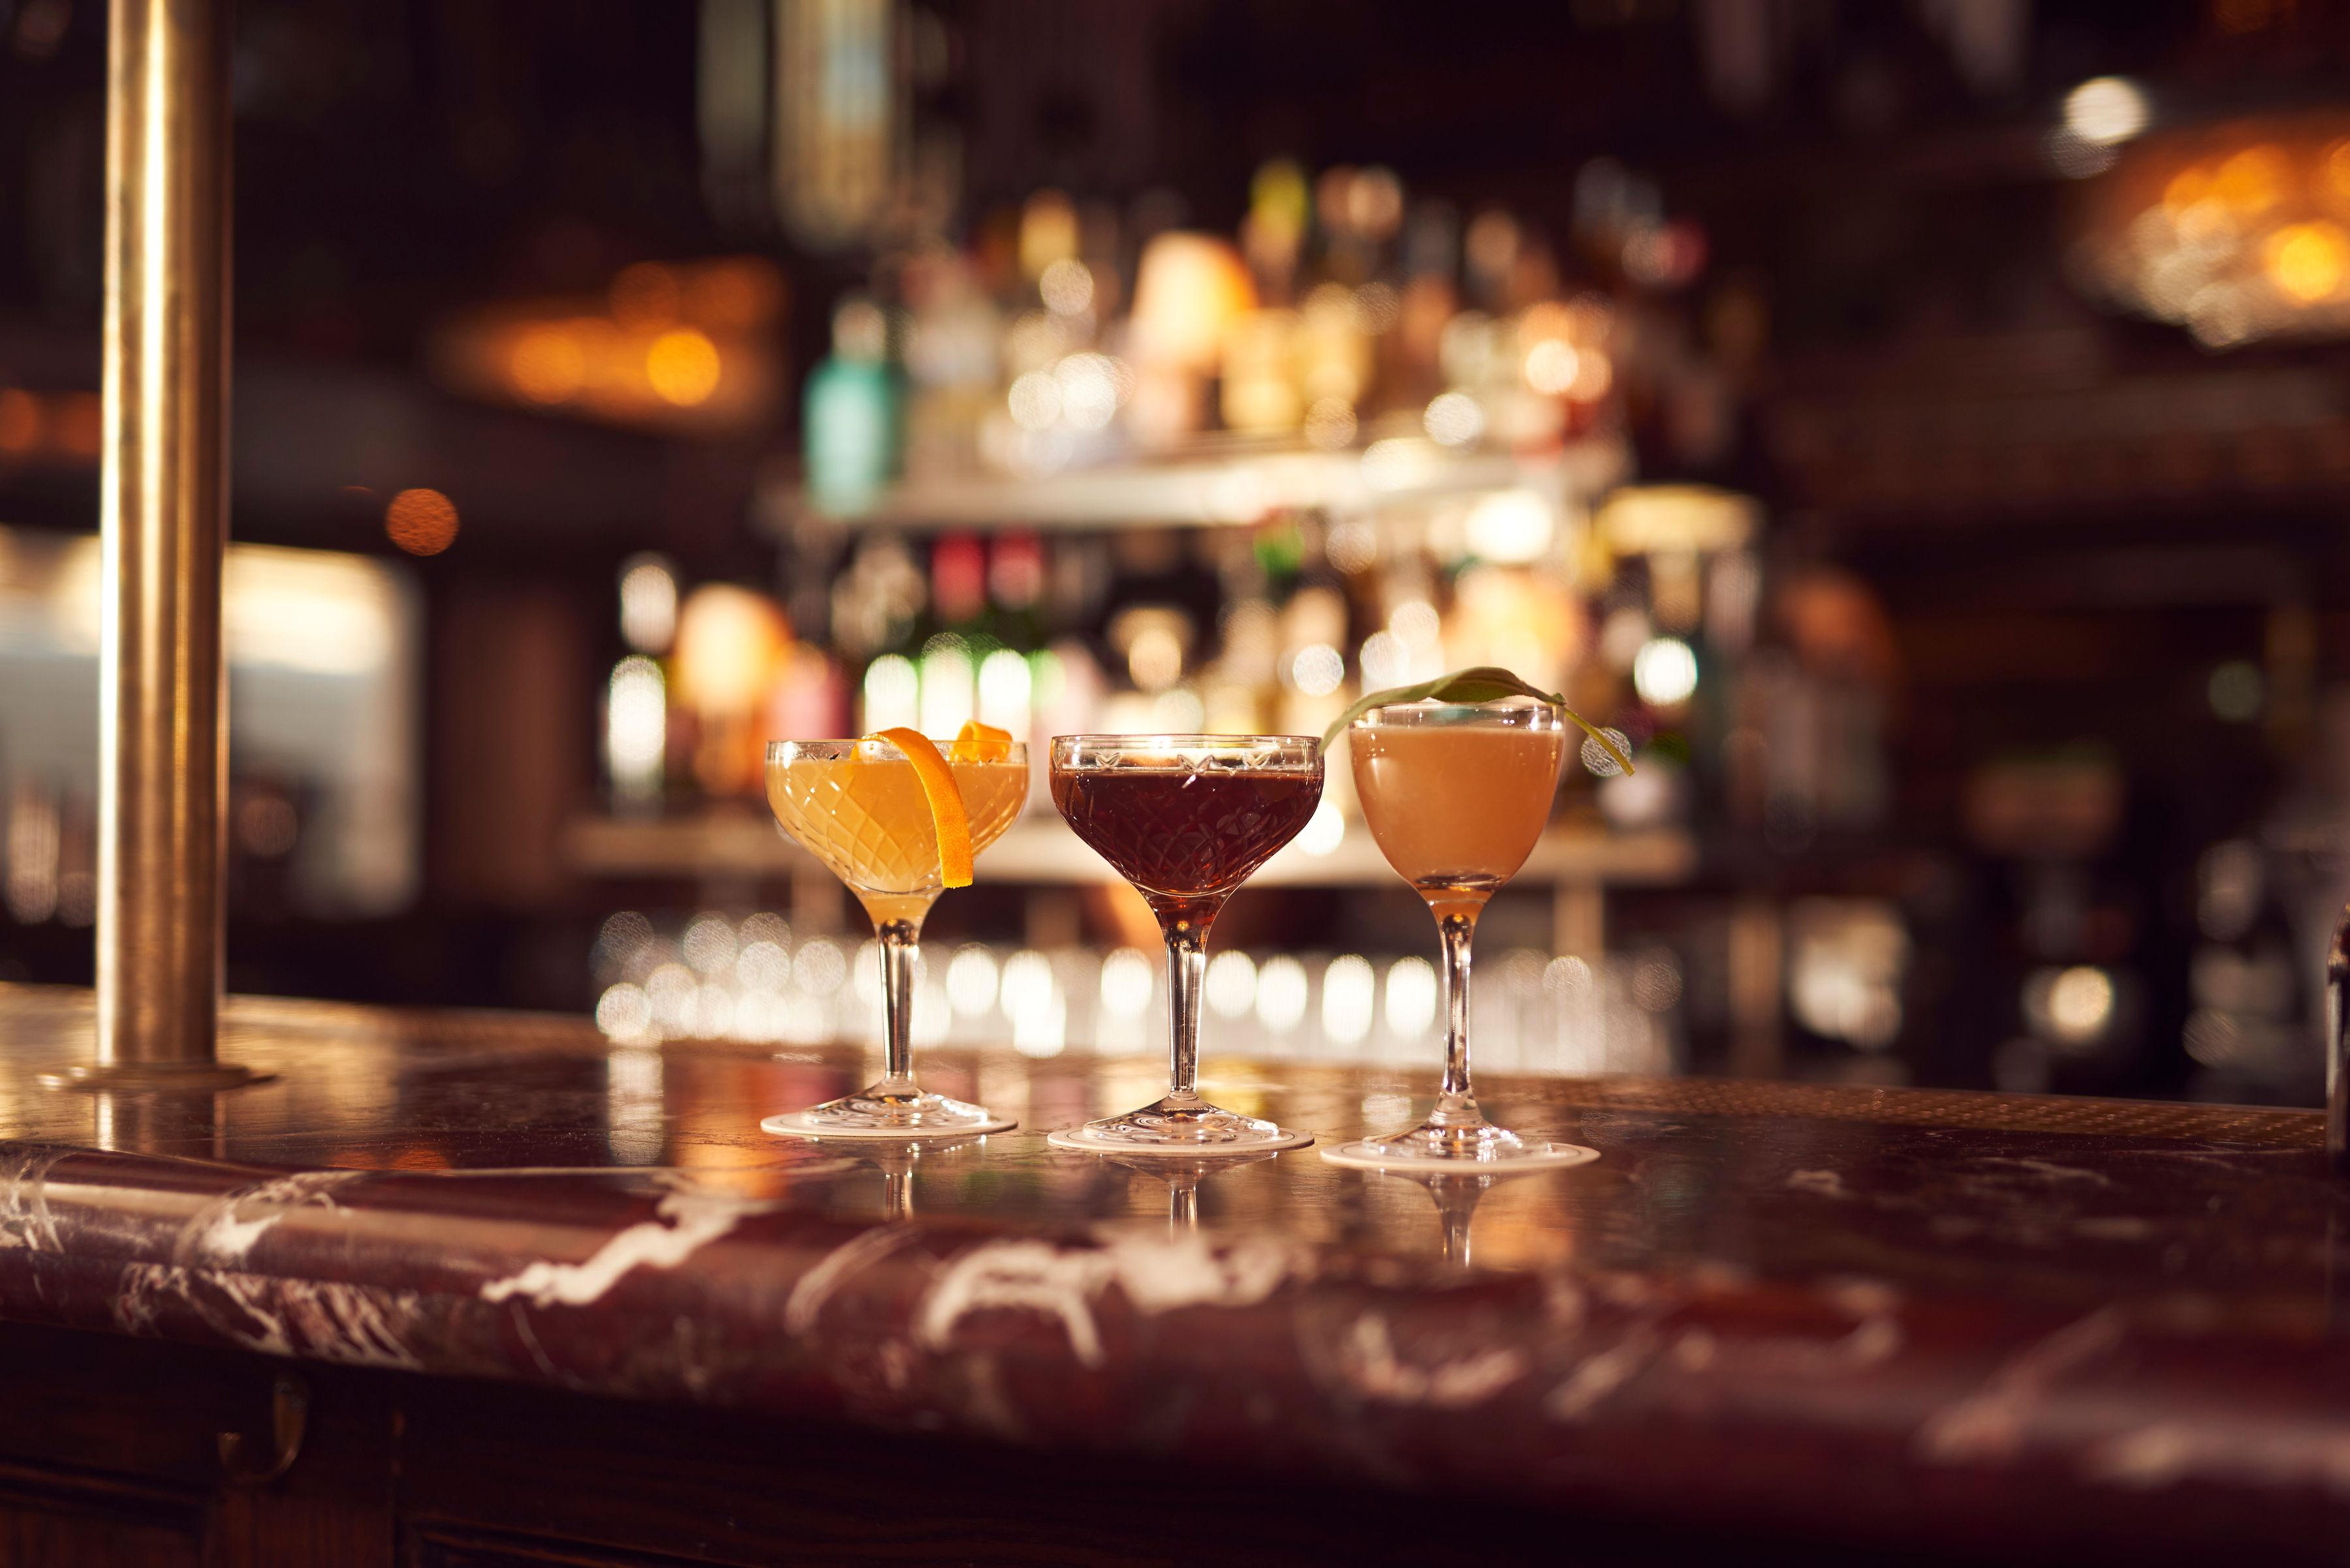 grand marnier cocktails, grand marnier pre-theatre cocktails, the grand menu